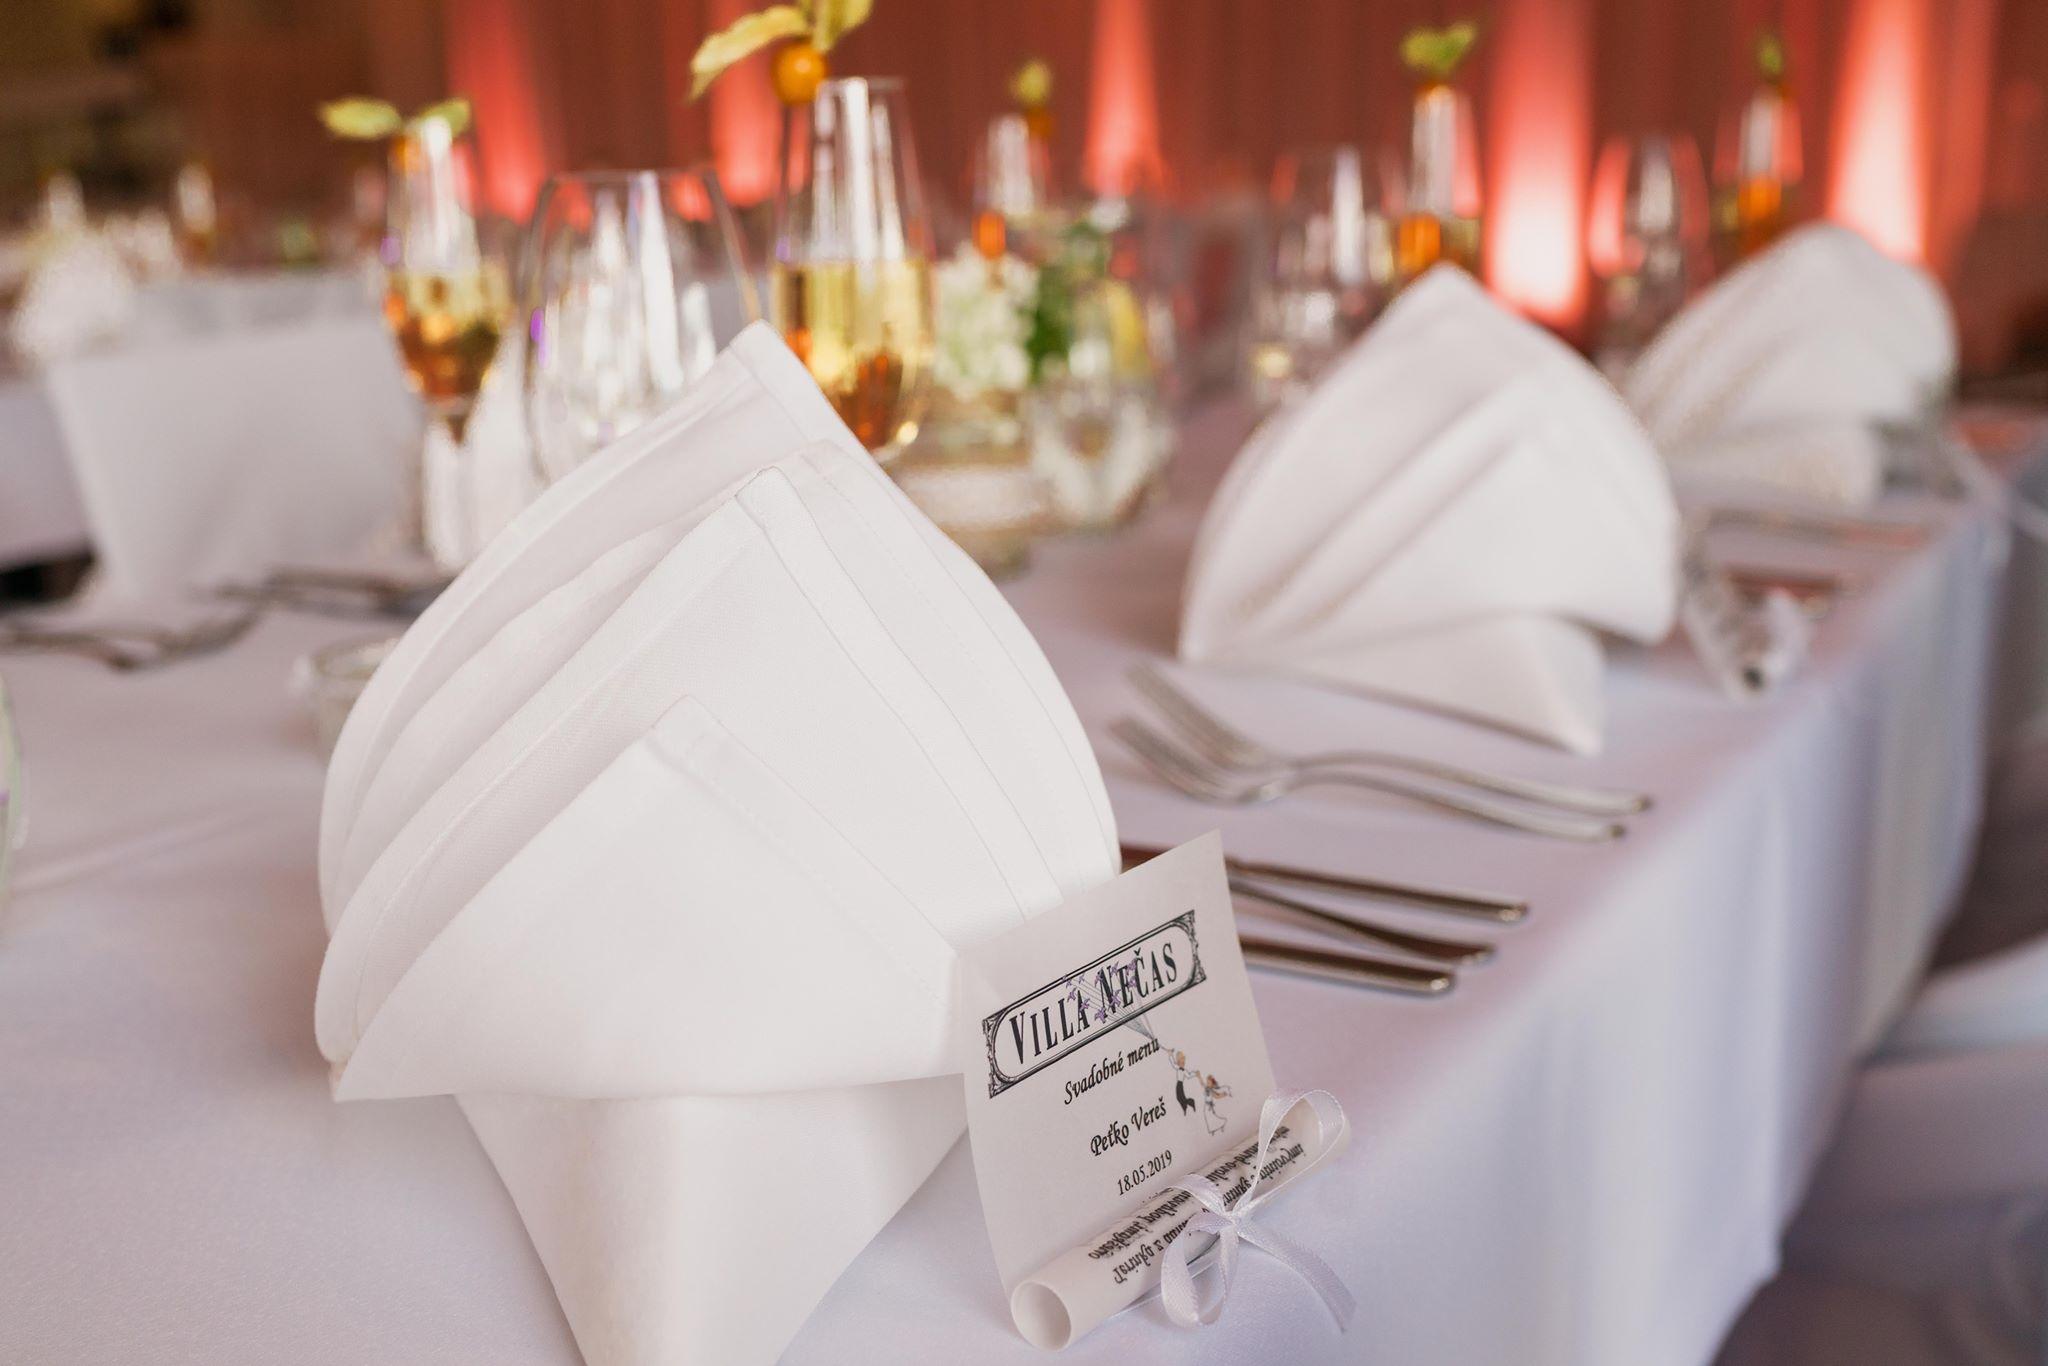 svadba-wedding-Villa-Necas-Zilina-DJ-moderator-starejsijpg